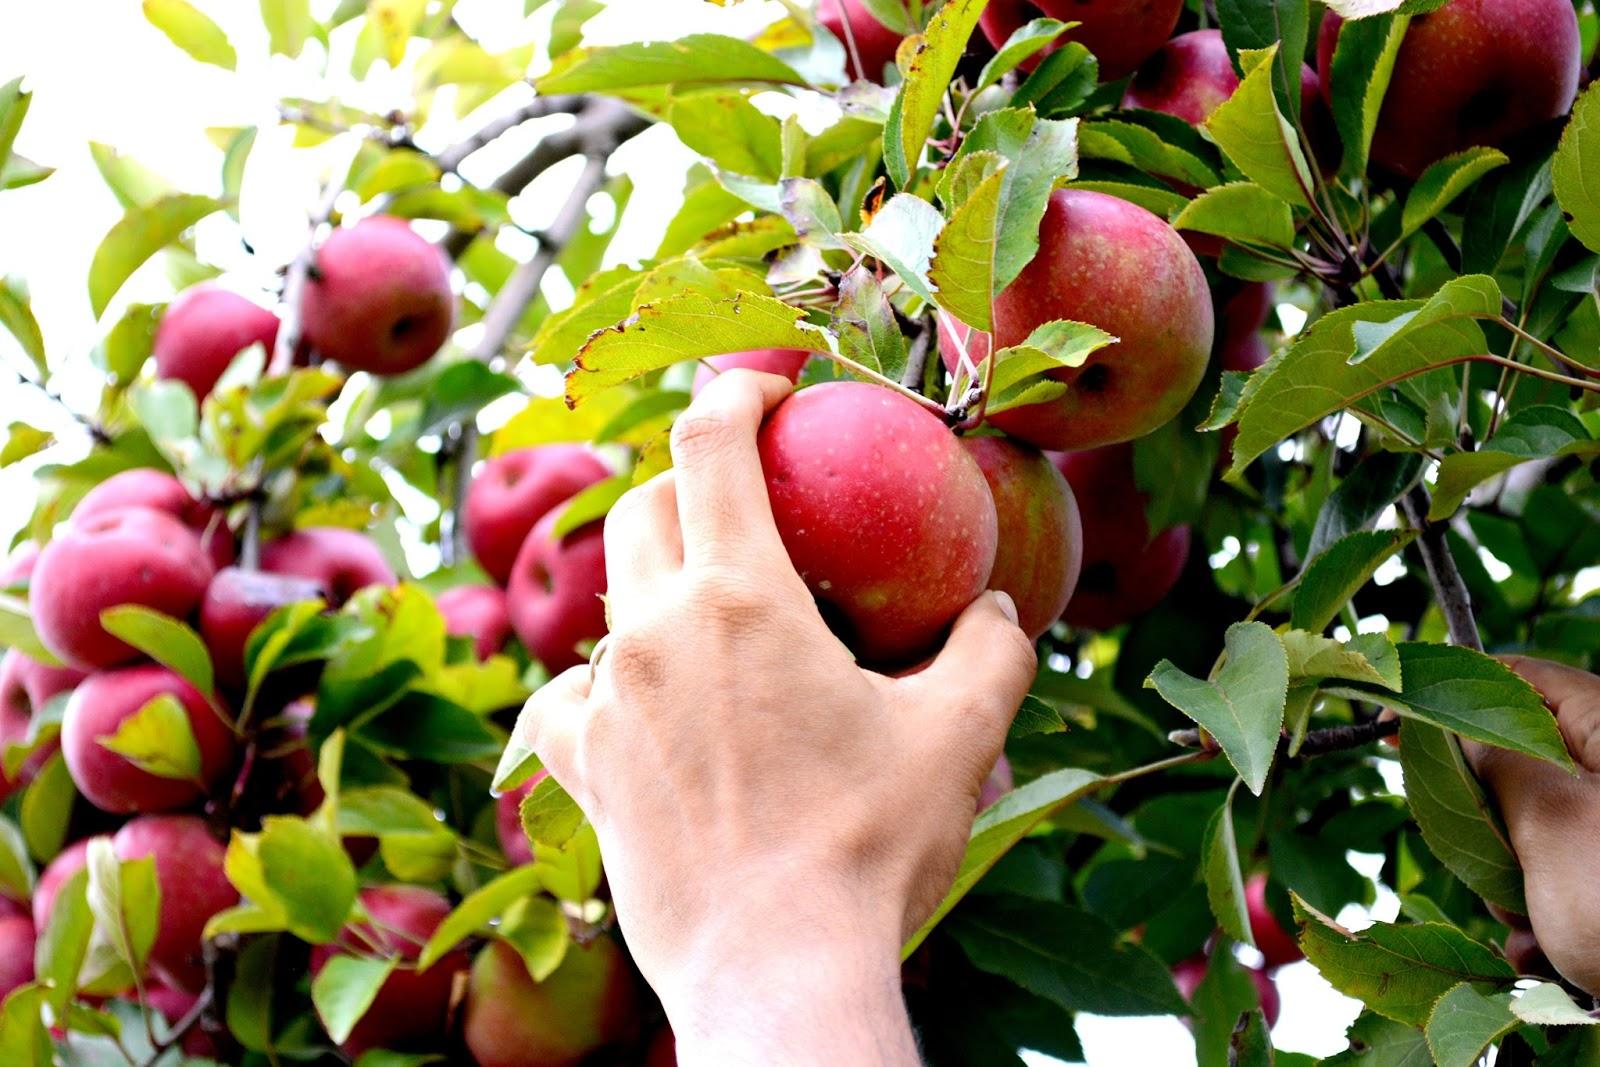 A foodie's travelogue #2 - Apple Picking at Ellijay, Georgia - Love